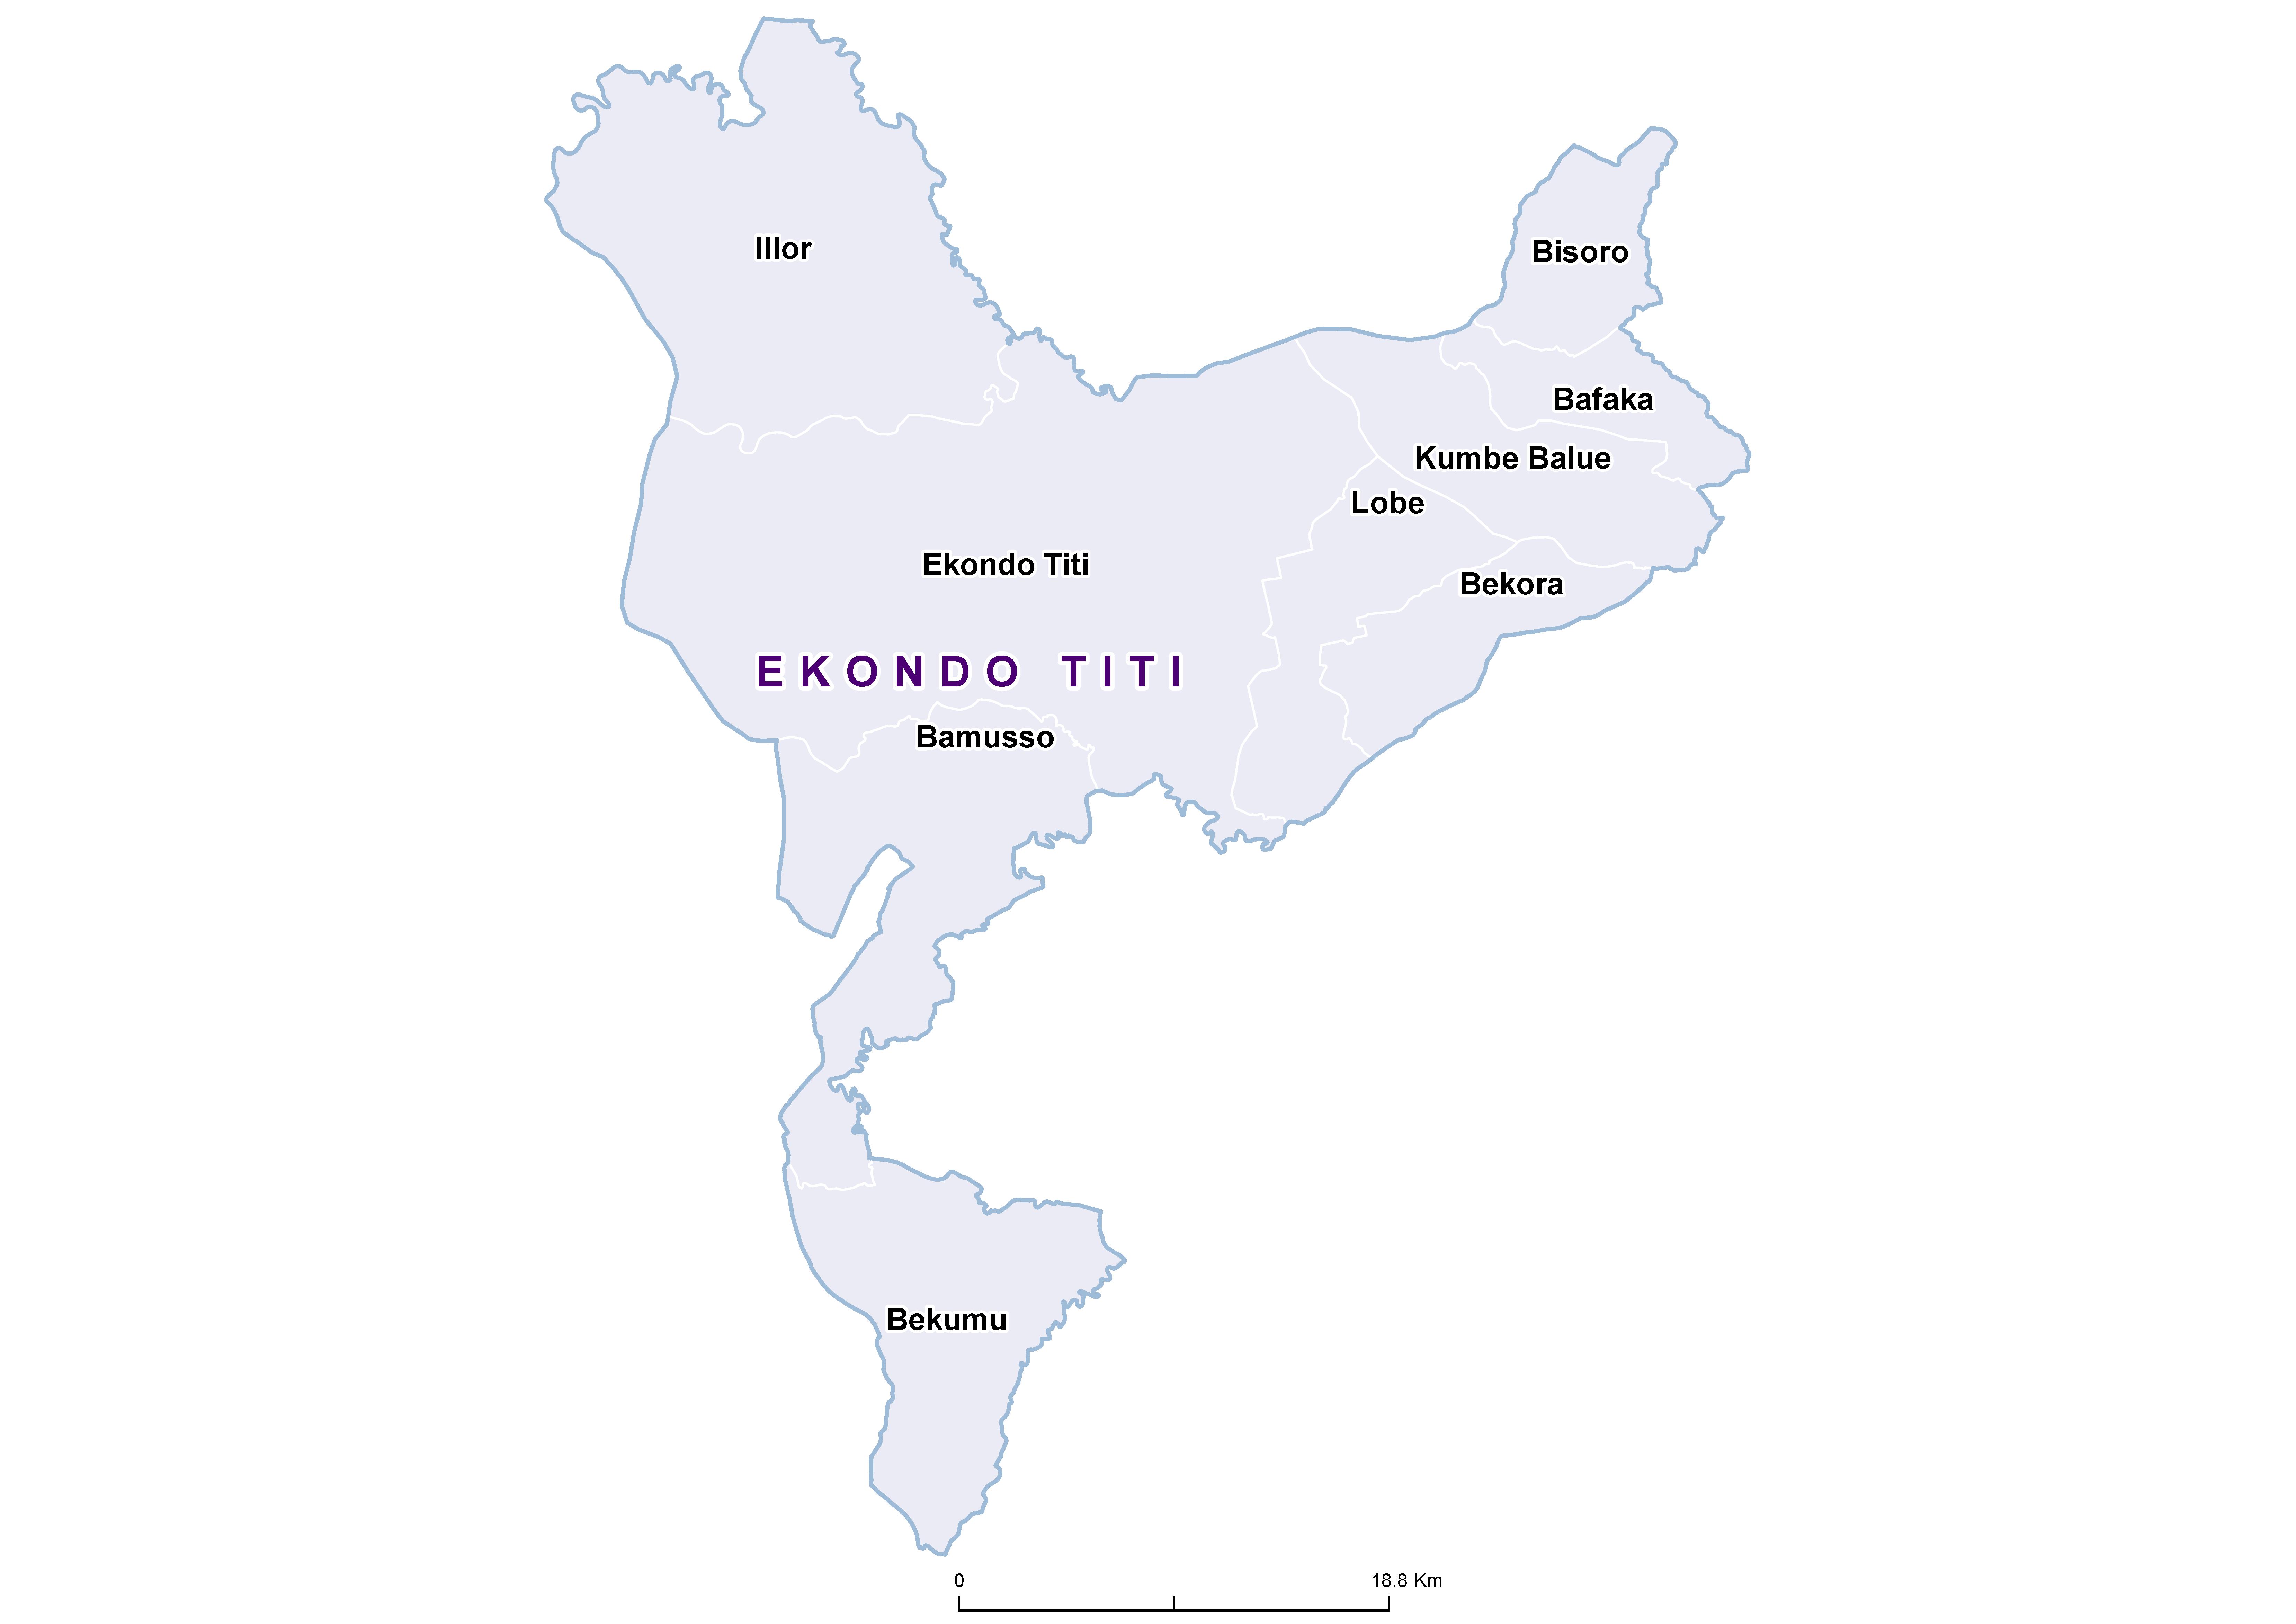 Ekondo titi SCH 20180001